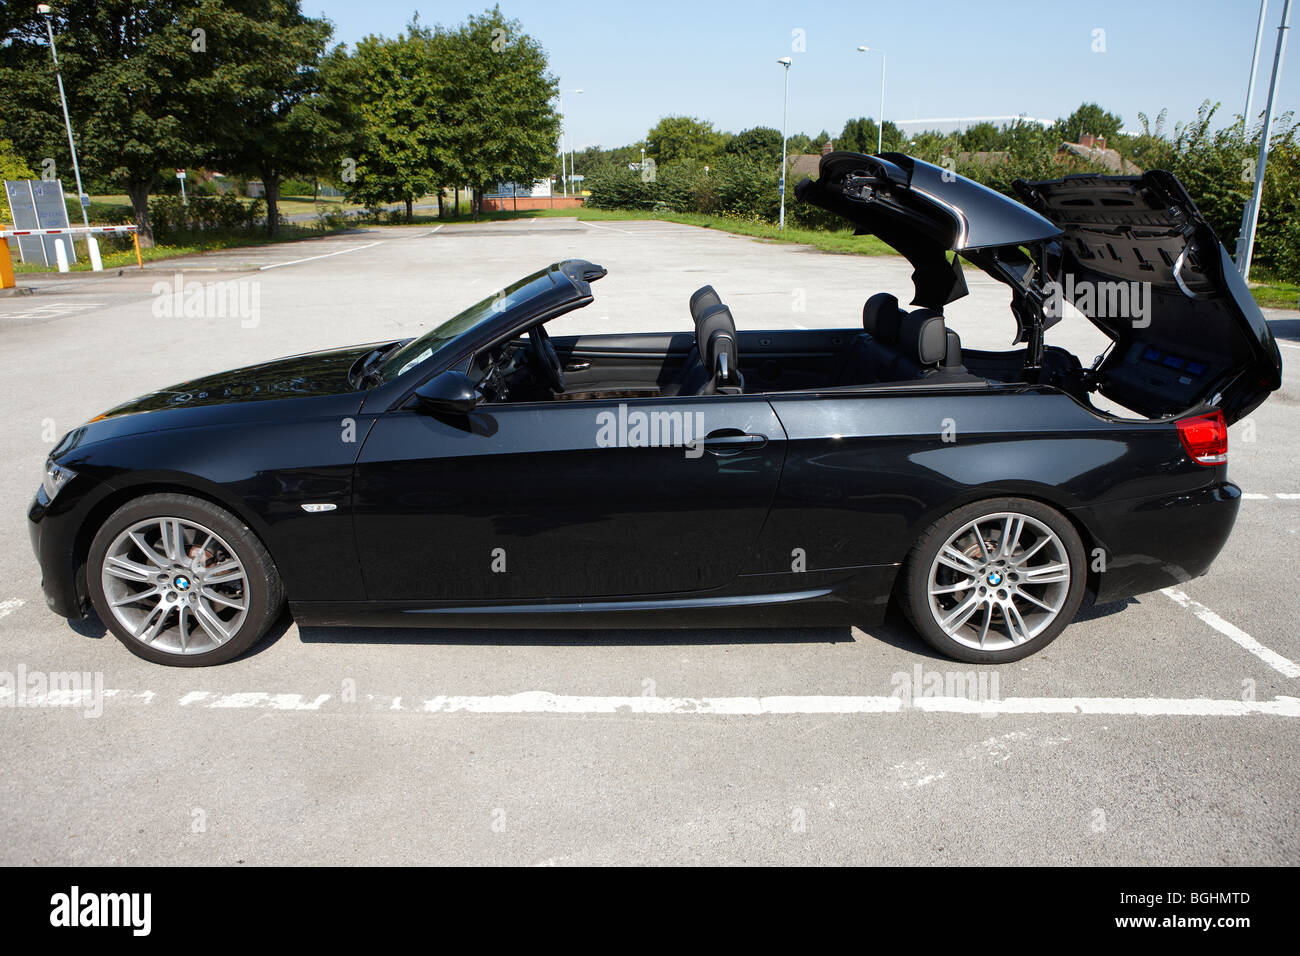 Black BMW Convertible - Stock Image